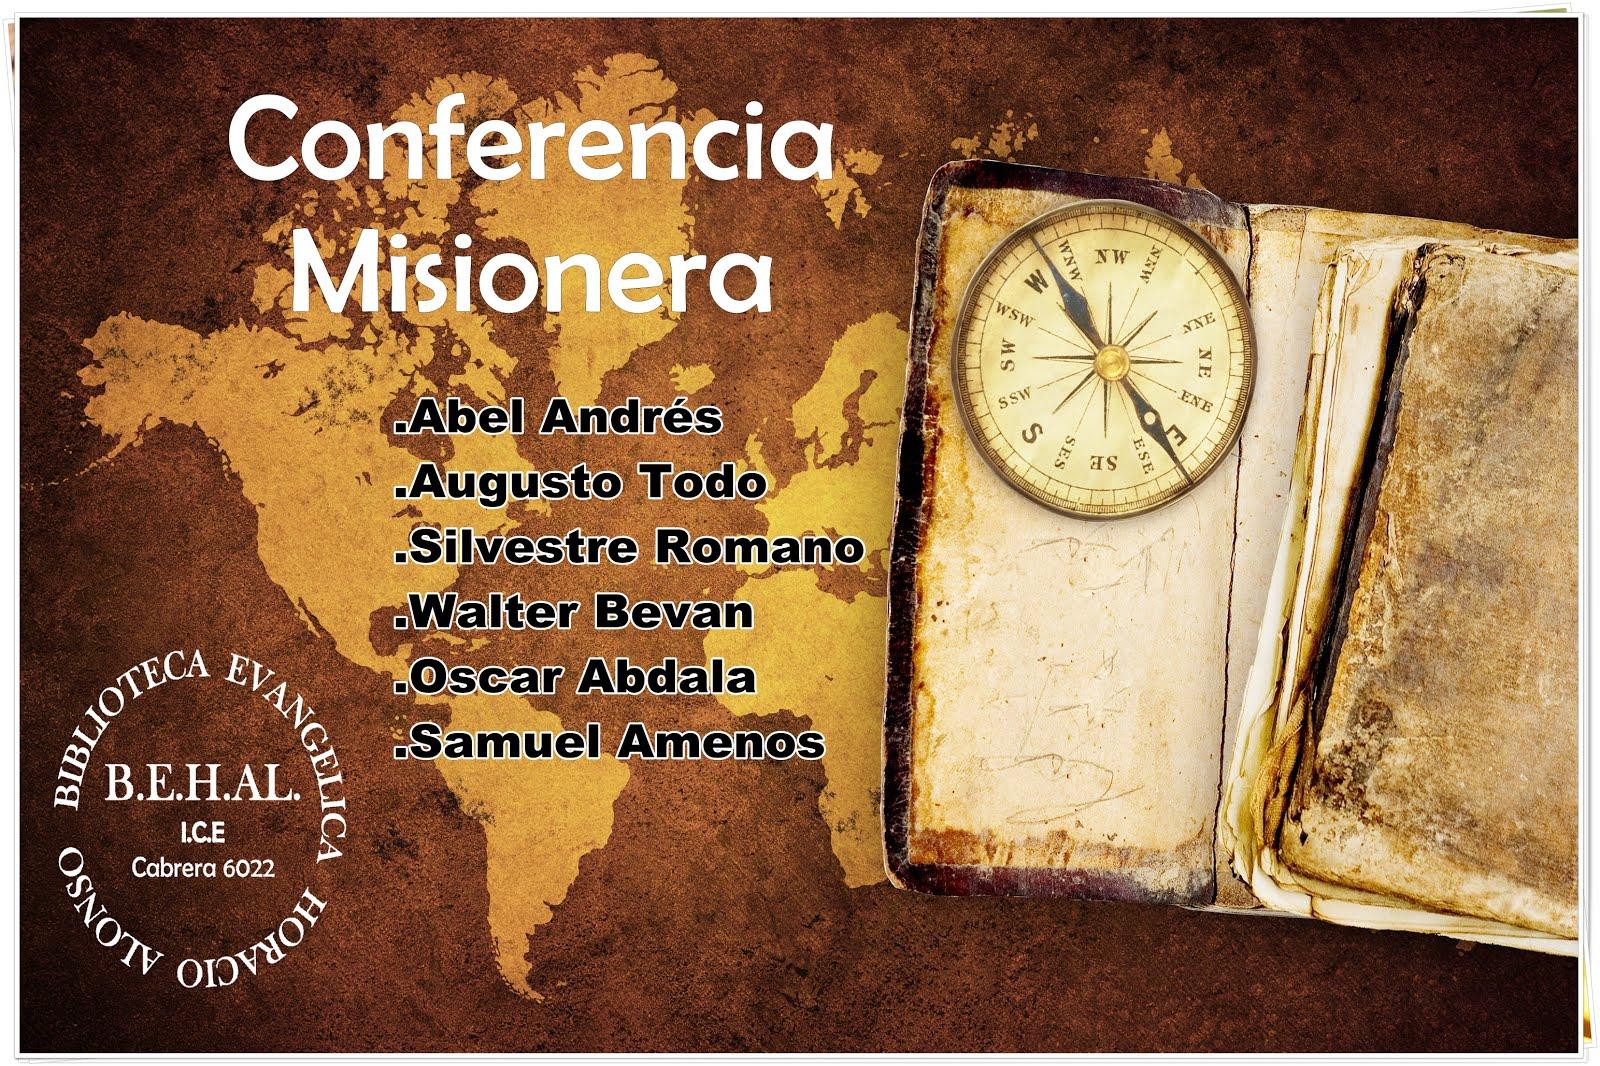 Audios-Conferencia Misionera Argentina 1985